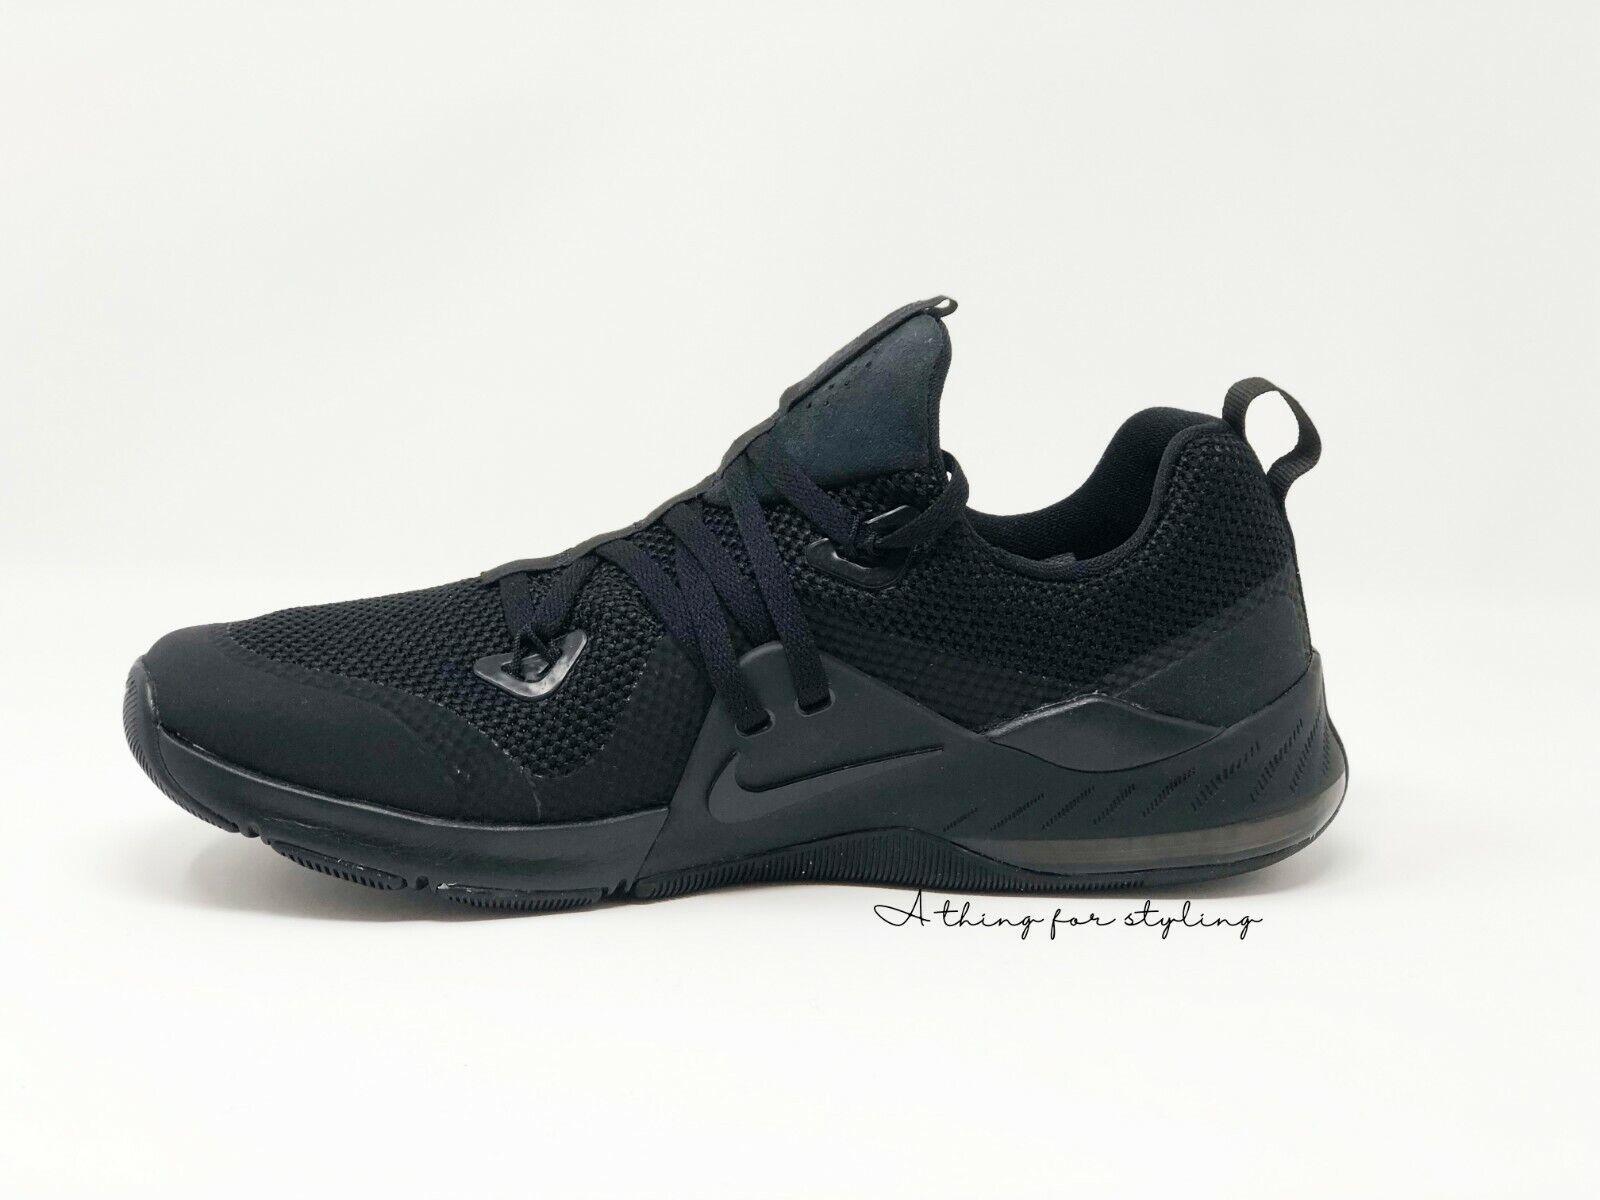 Nike Zoom Train Command Cross Training shoes Black Black Size 8.5 MSRP 120